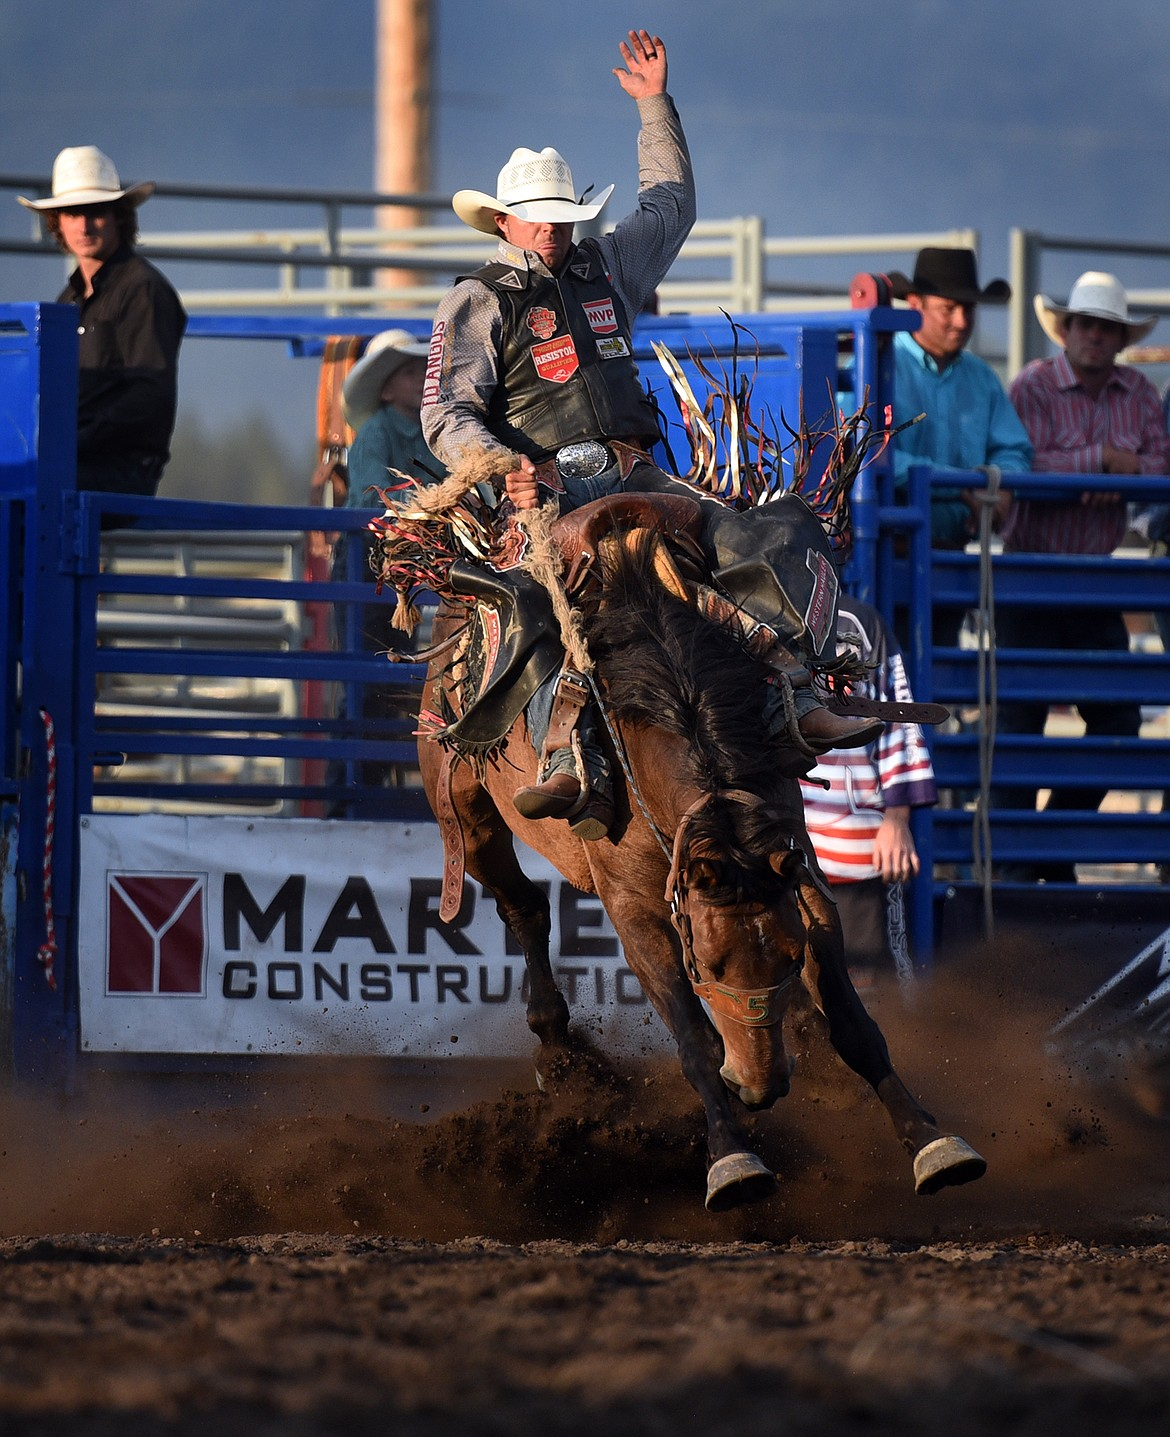 Layton Green of Meeting Creek, Alberta, Canada holds on tight during saddle bronc action at the Bigfork Summer Rodeo Wednesday July 7, 2021. (Jeremy Weber/Bigfork Eagle)